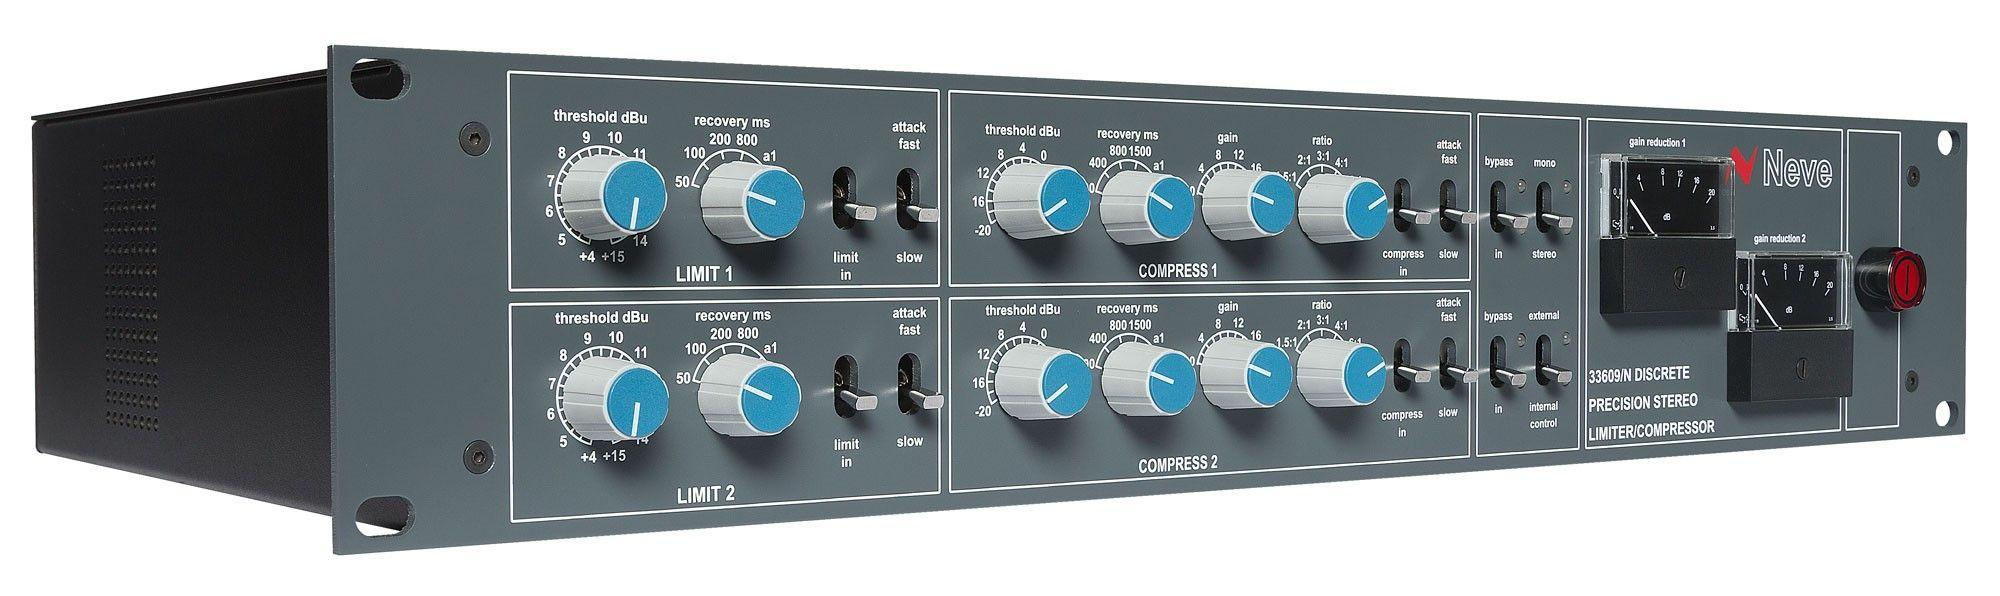 AMS Neve 33609 N Discrete Dual / stereo compressor limiter - The Neve 33609  Stereo Compressor offers comprehen…   Stereo, Digital dj, Loudspeaker  management systems